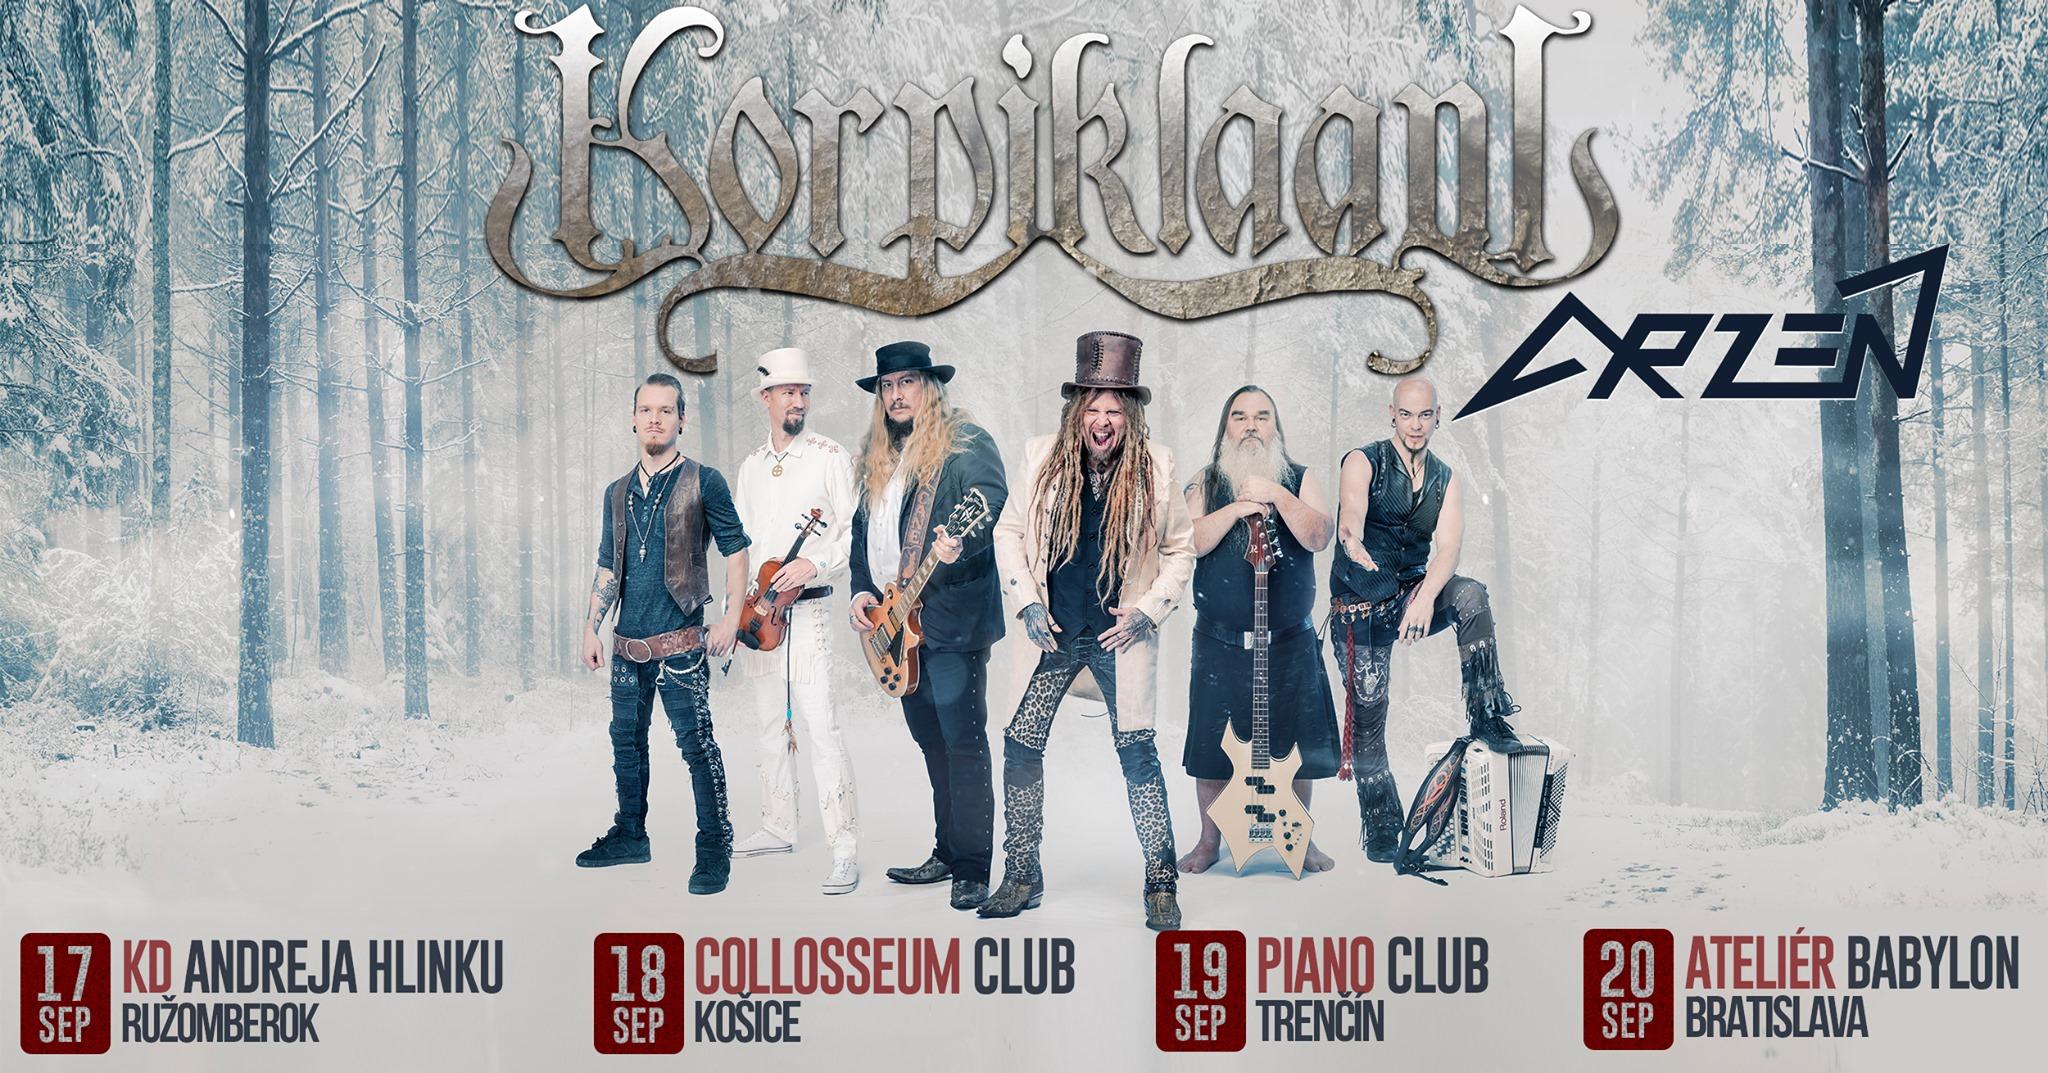 Korpiklaani & Arzén tour 2020 | Trenčín, Piano Club